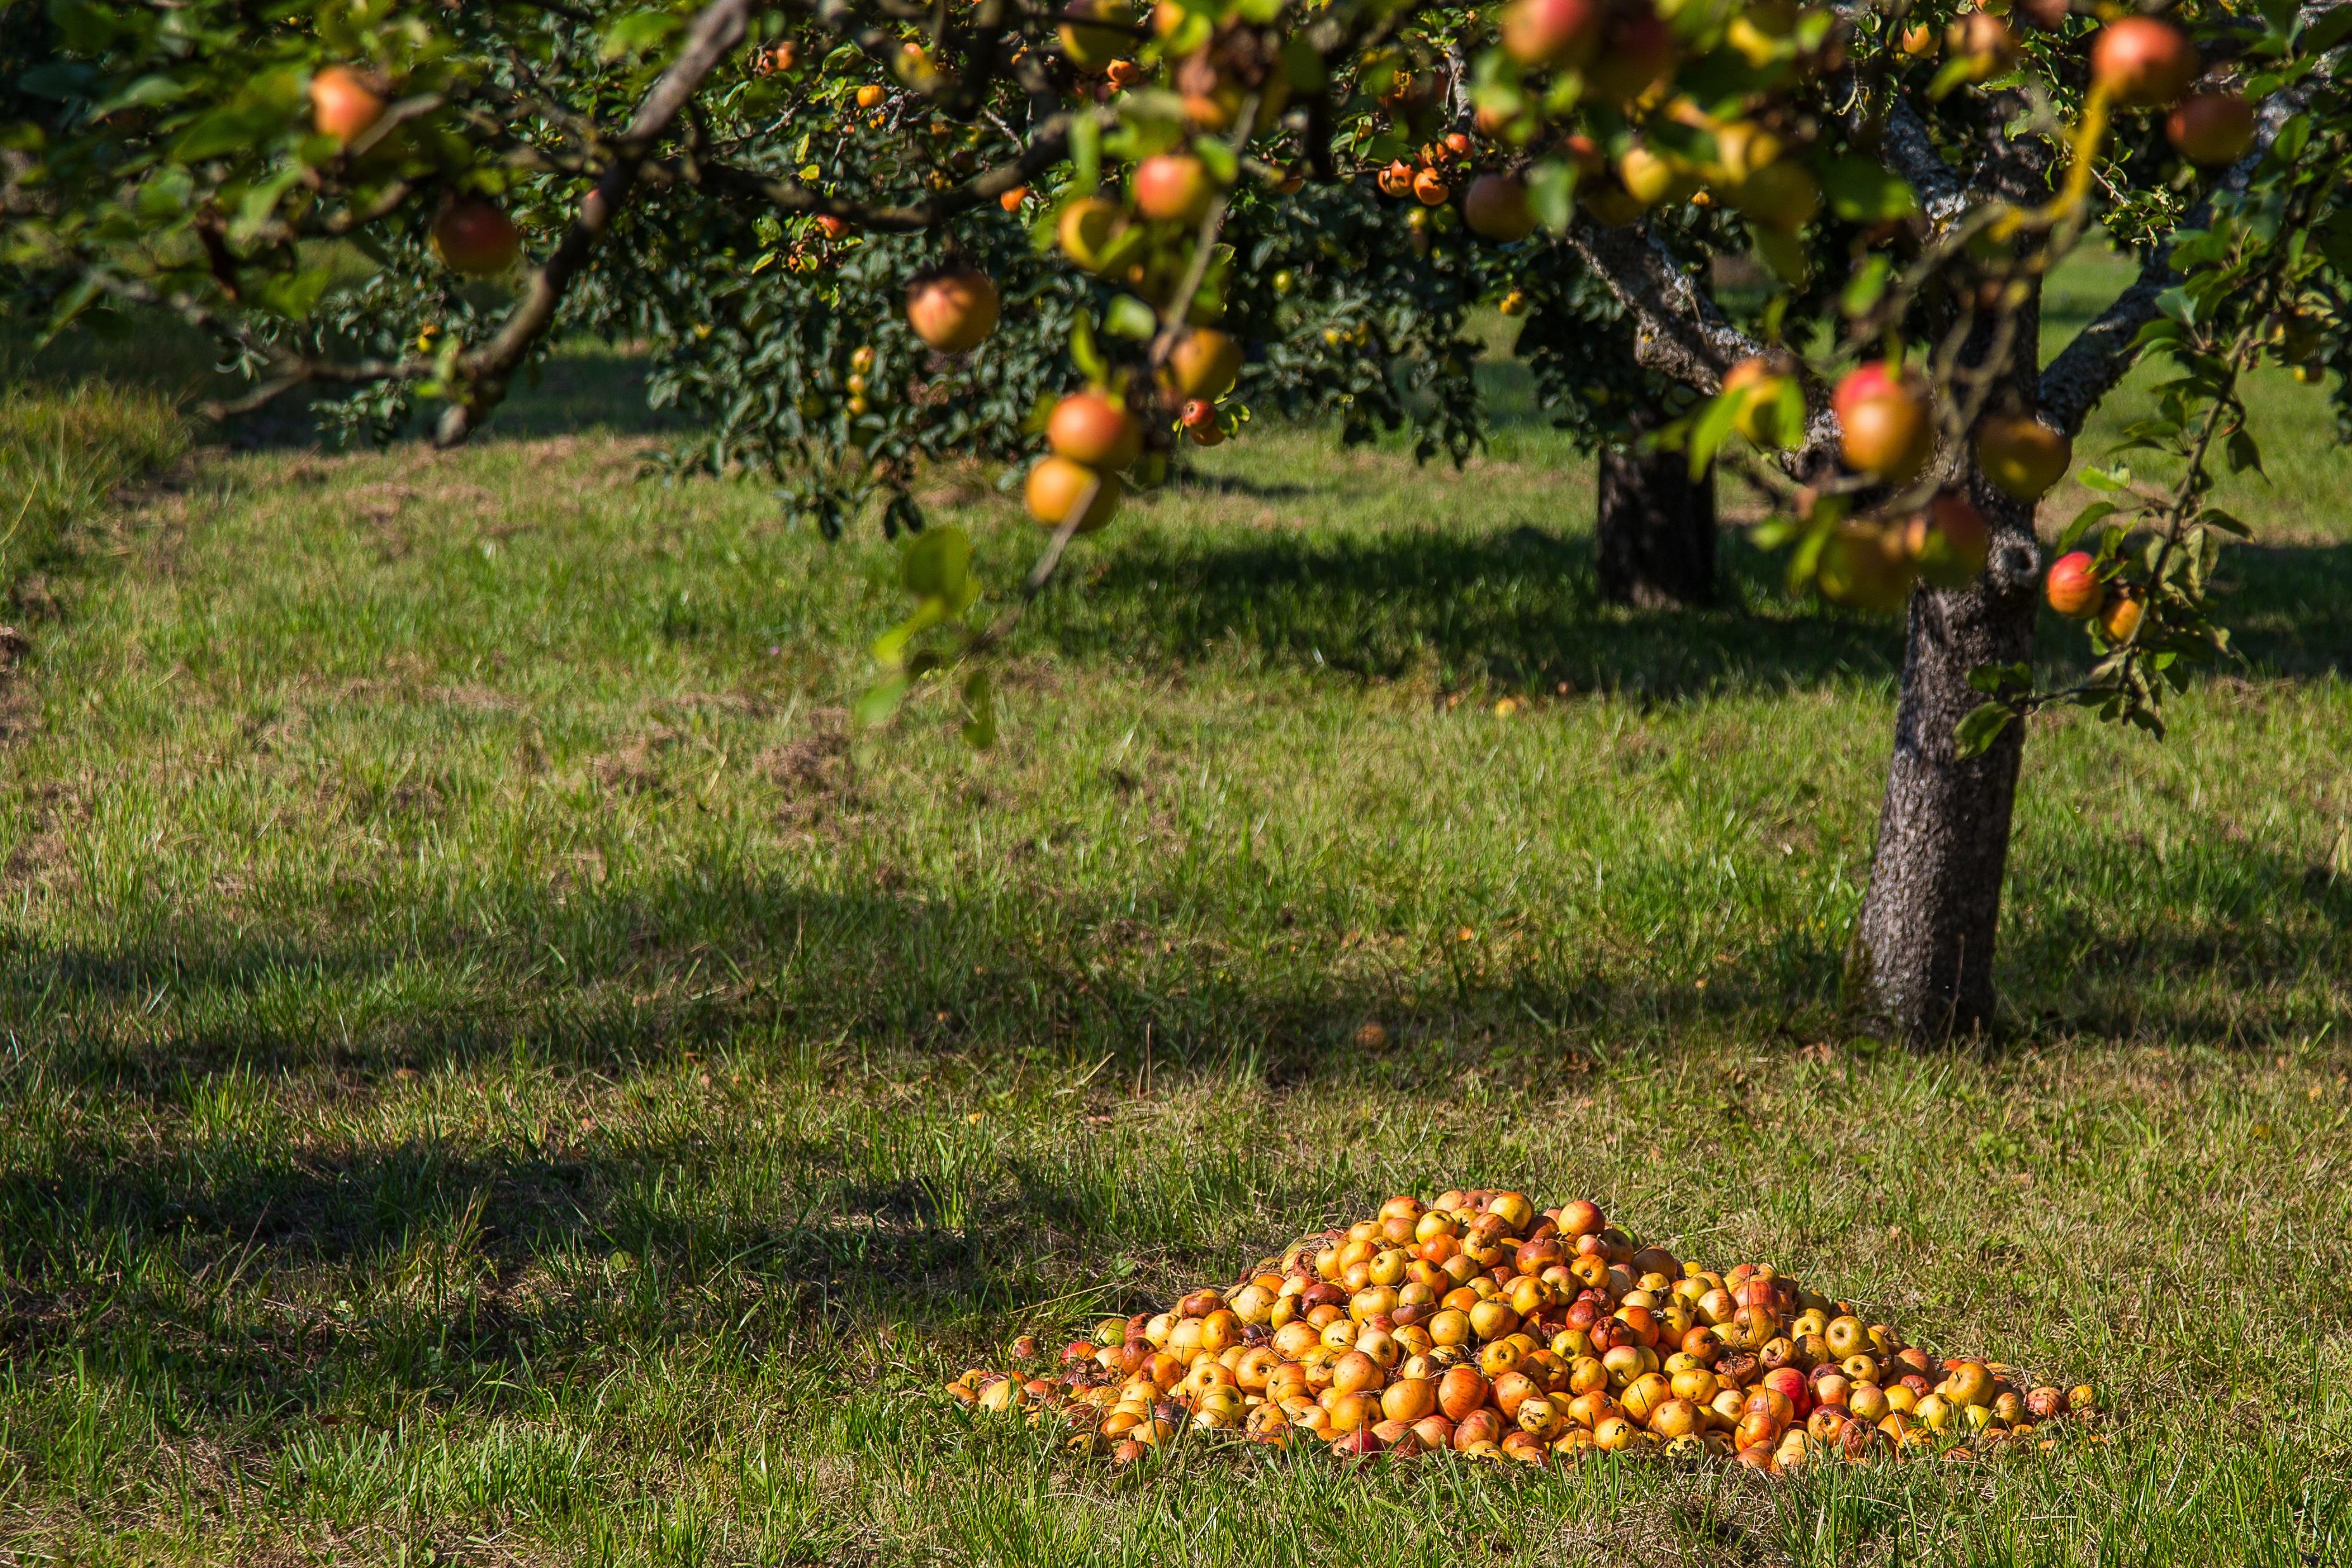 картинки сад с яблонями плодов проводят утром